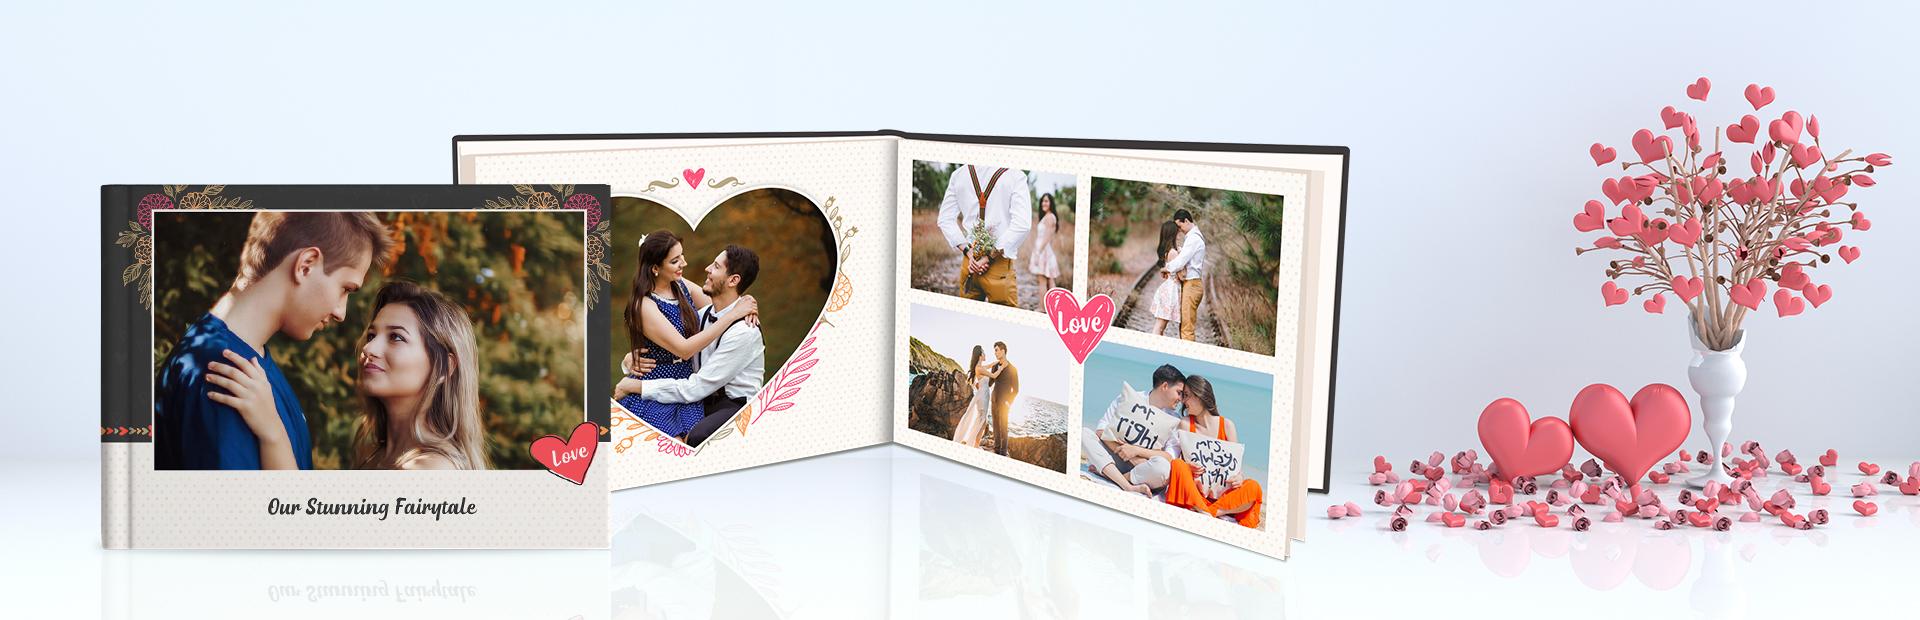 Love Photo Albums